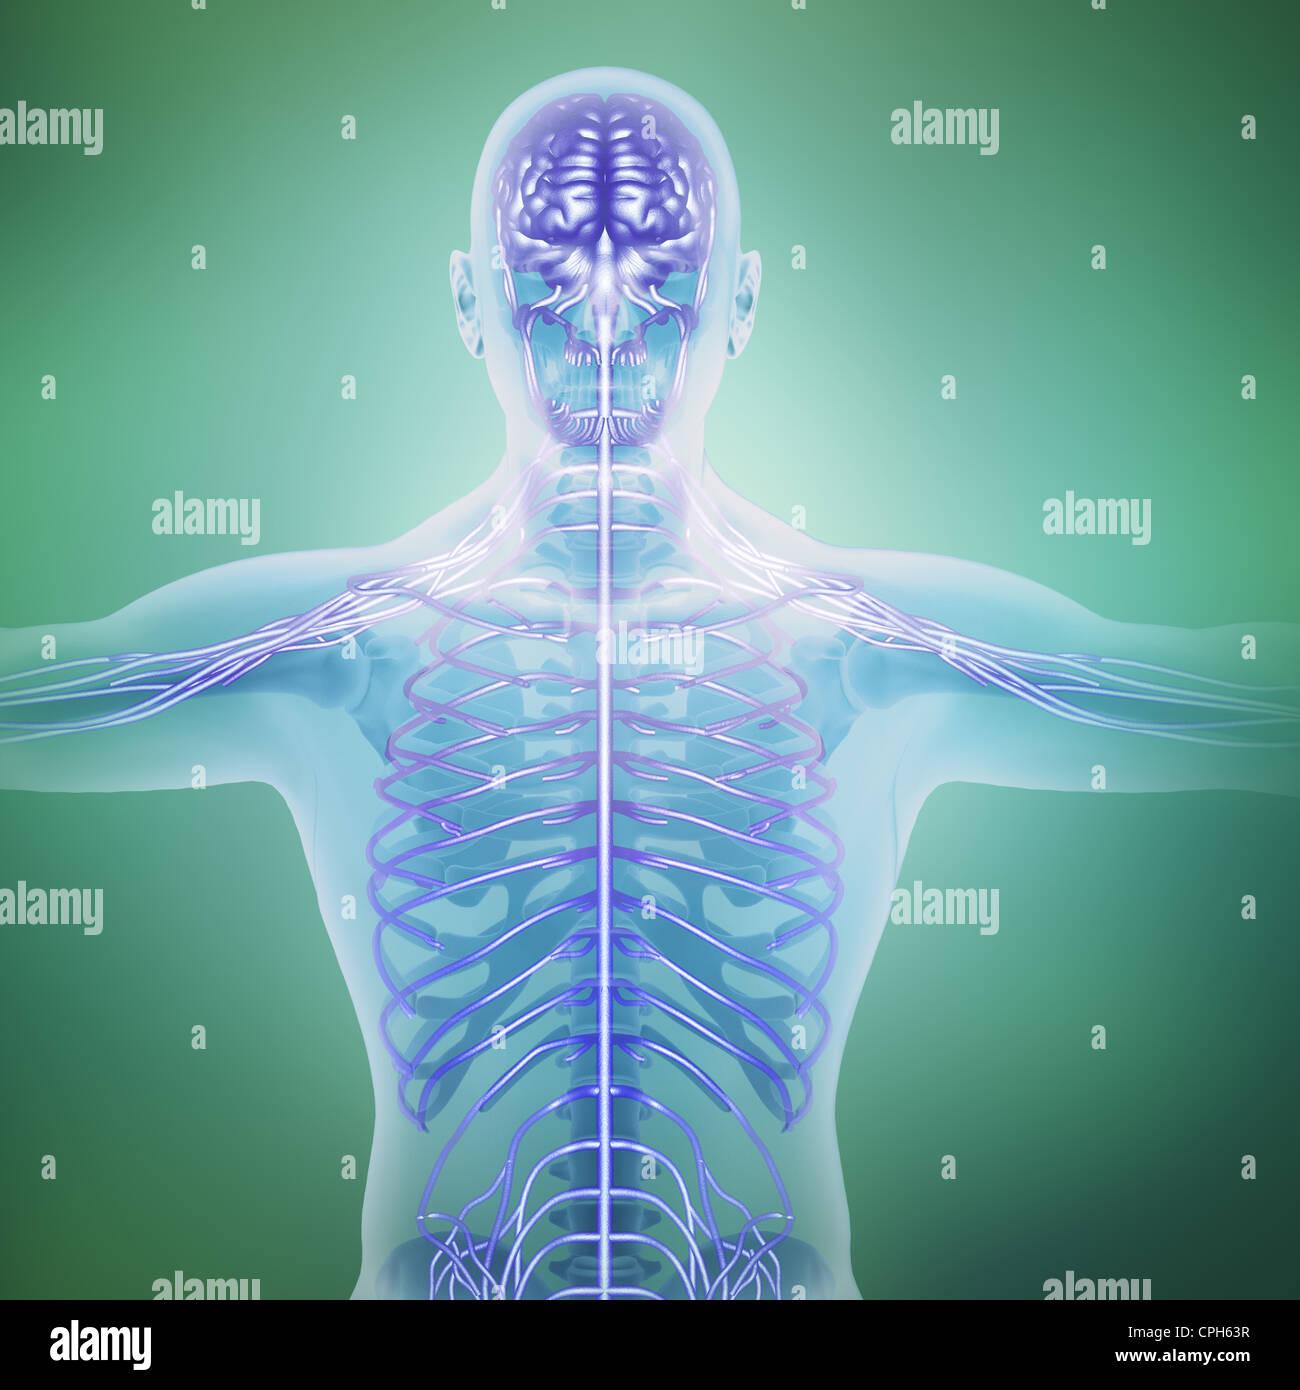 L'anatomie humaine illustration - système nerveux central Banque D'Images